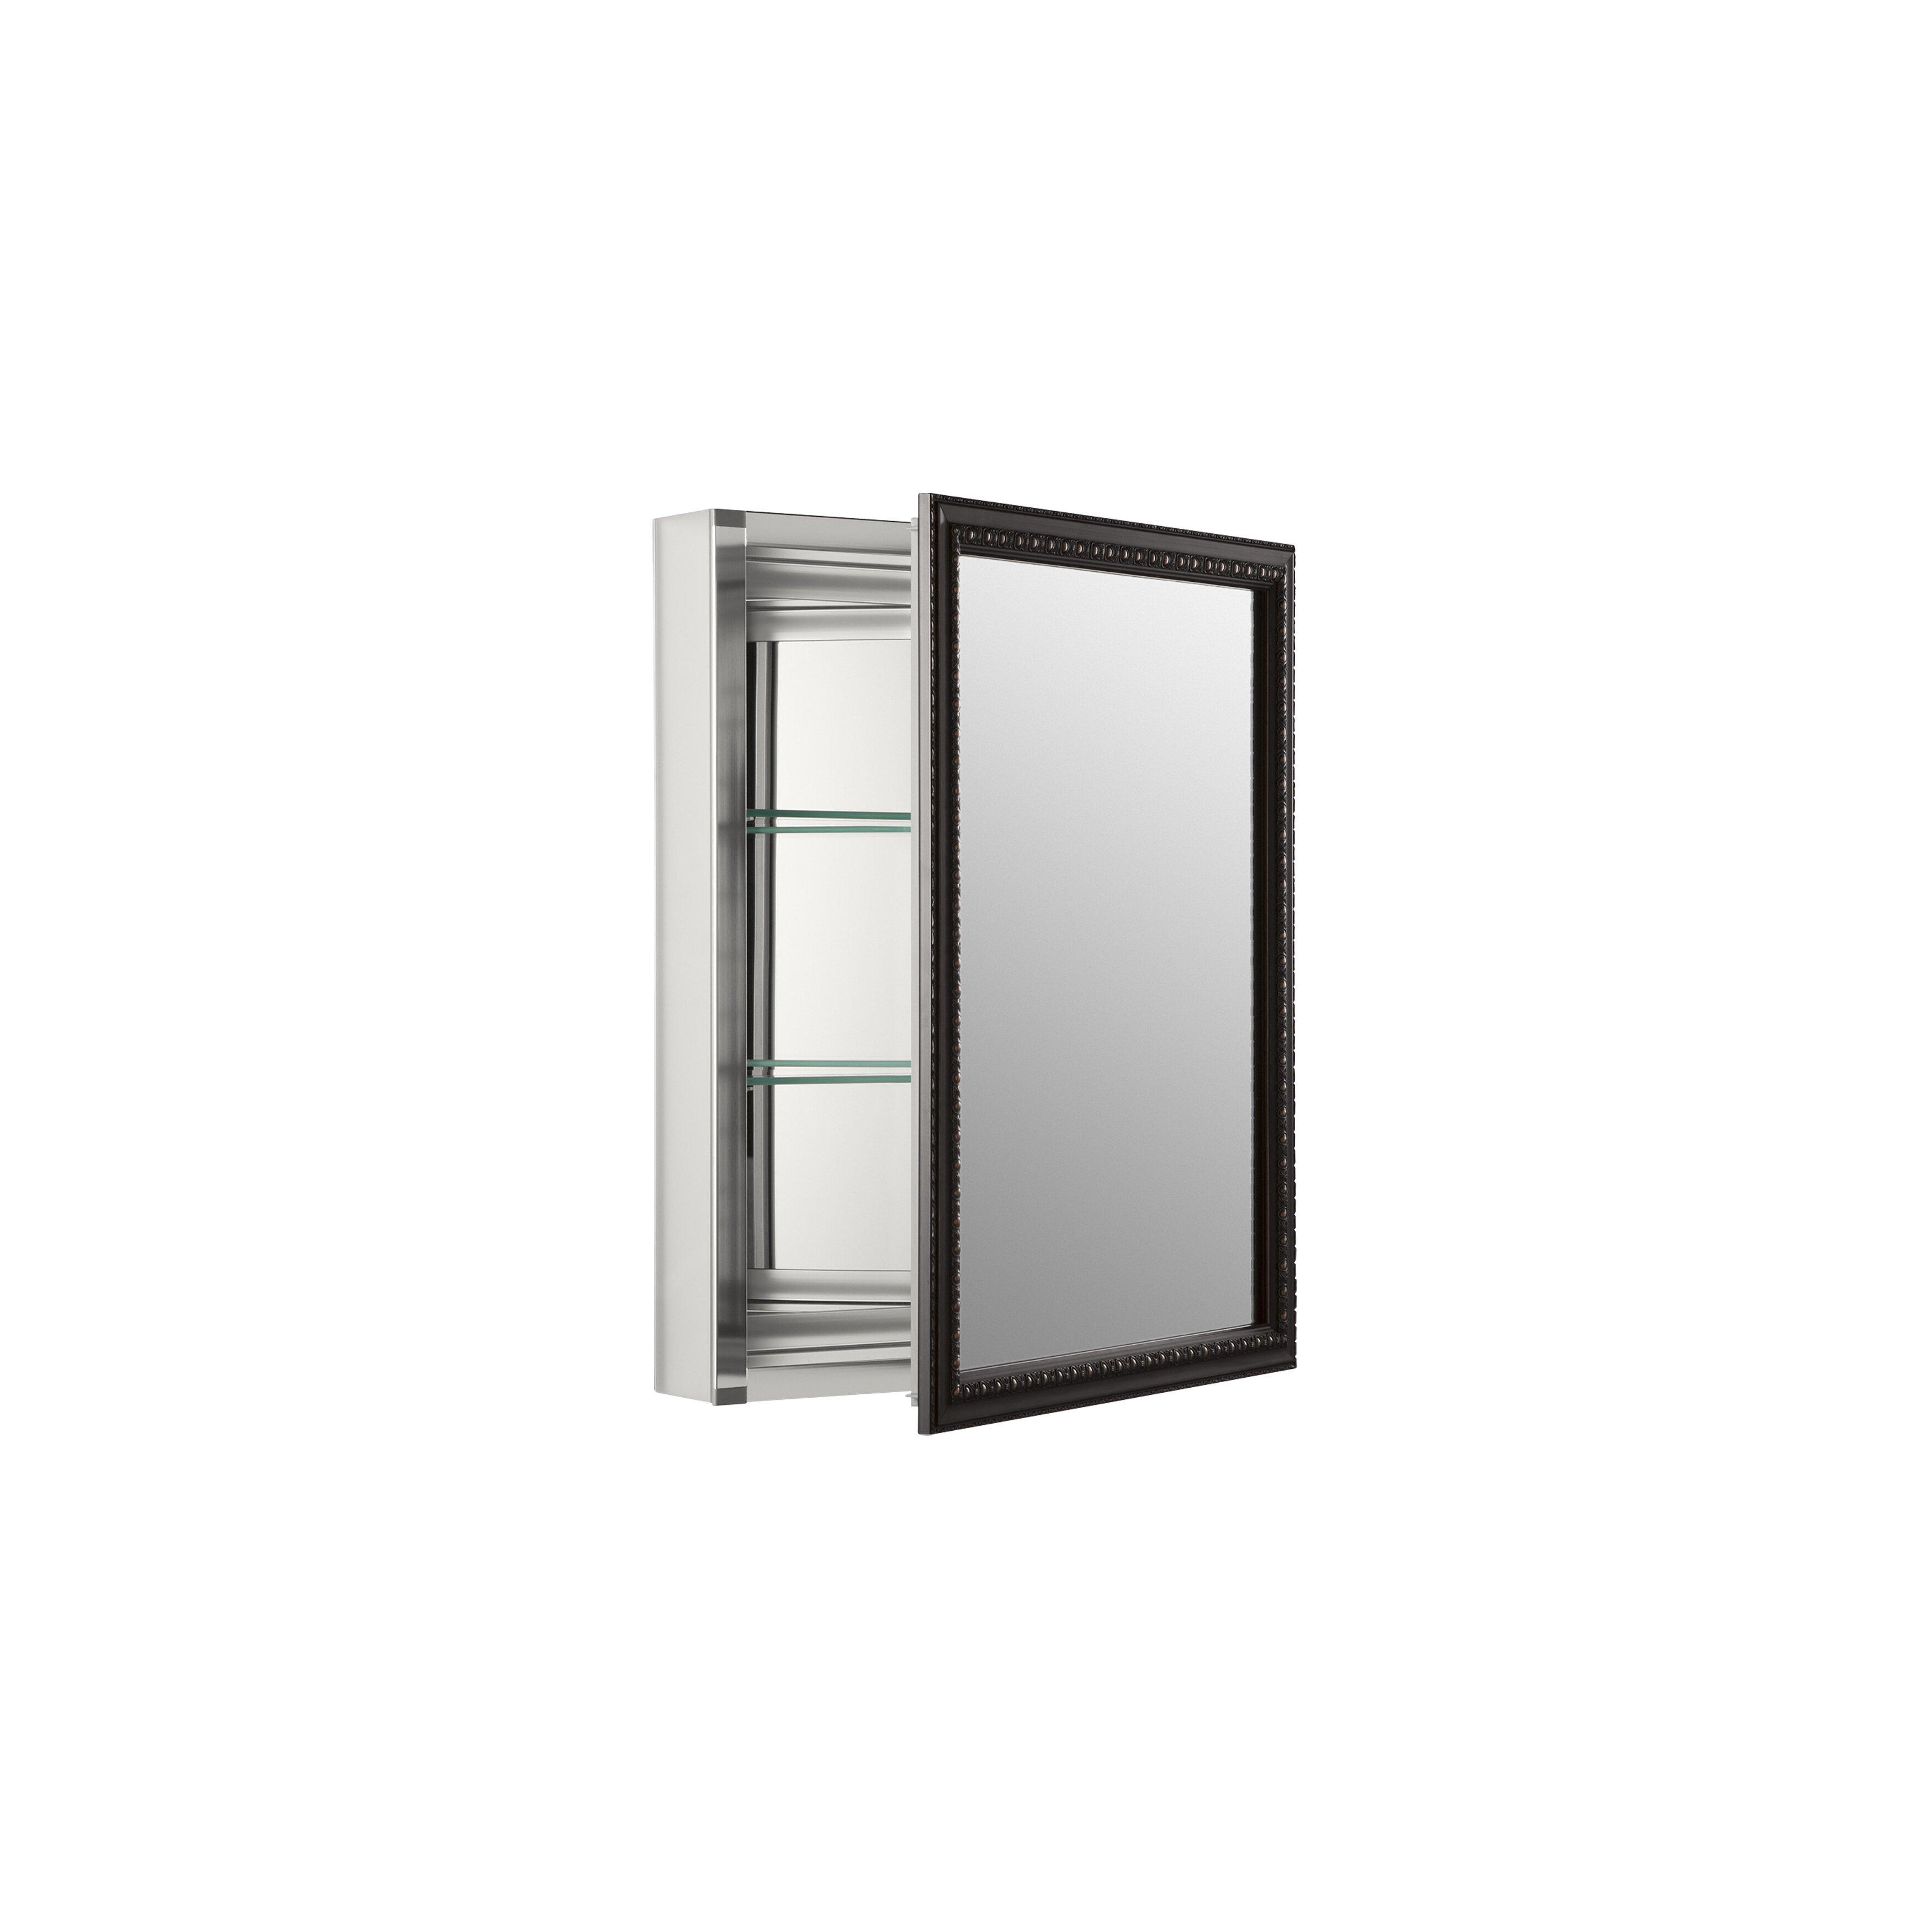 Jensen Medicine Cabinet Kohler 20 X 26 Wall Mount Mirrored Medicine Cabinet With